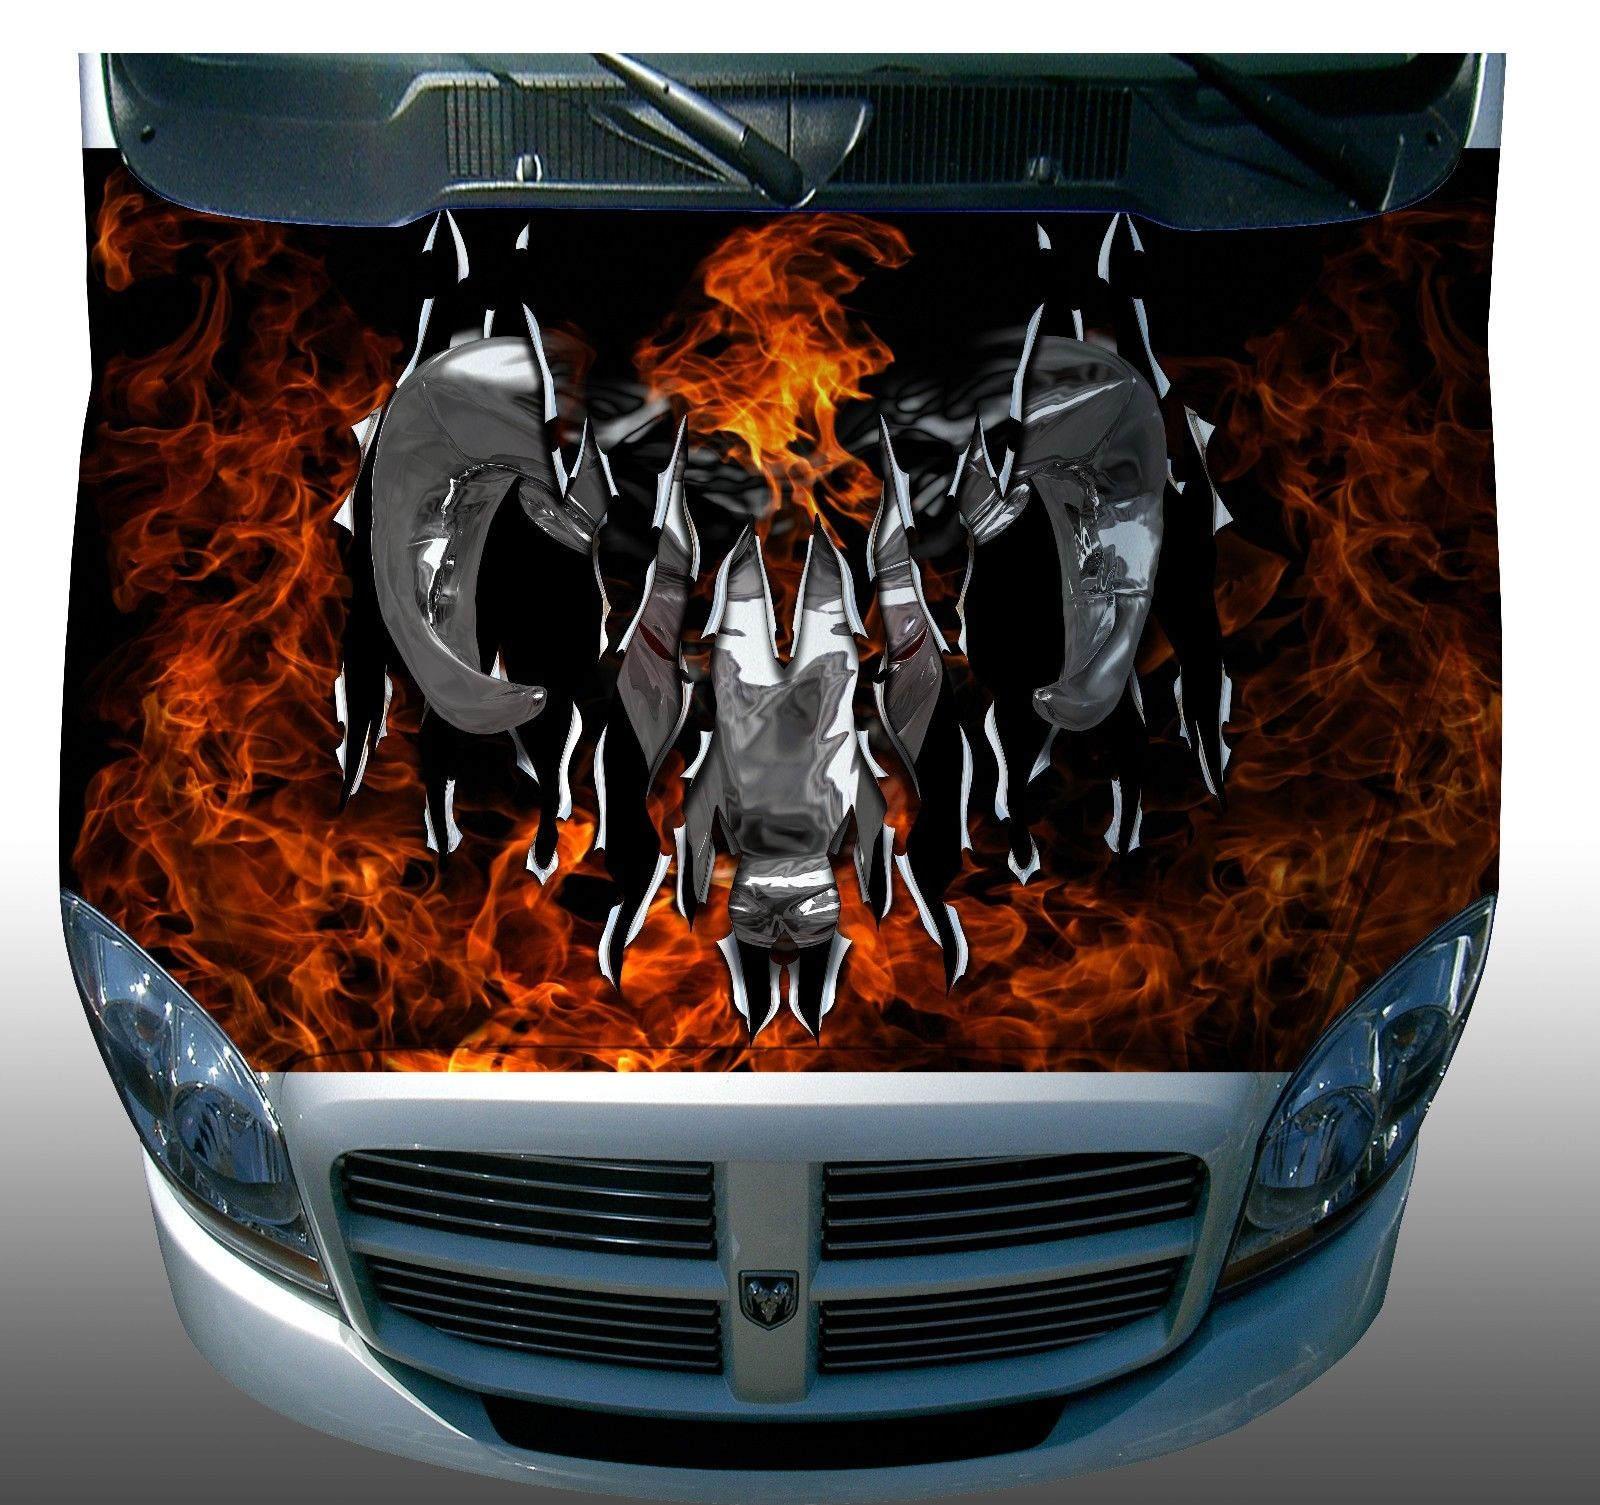 Dodge Ram Flame Fire Hood Wrap Wraps Sticker Vinyl Decal